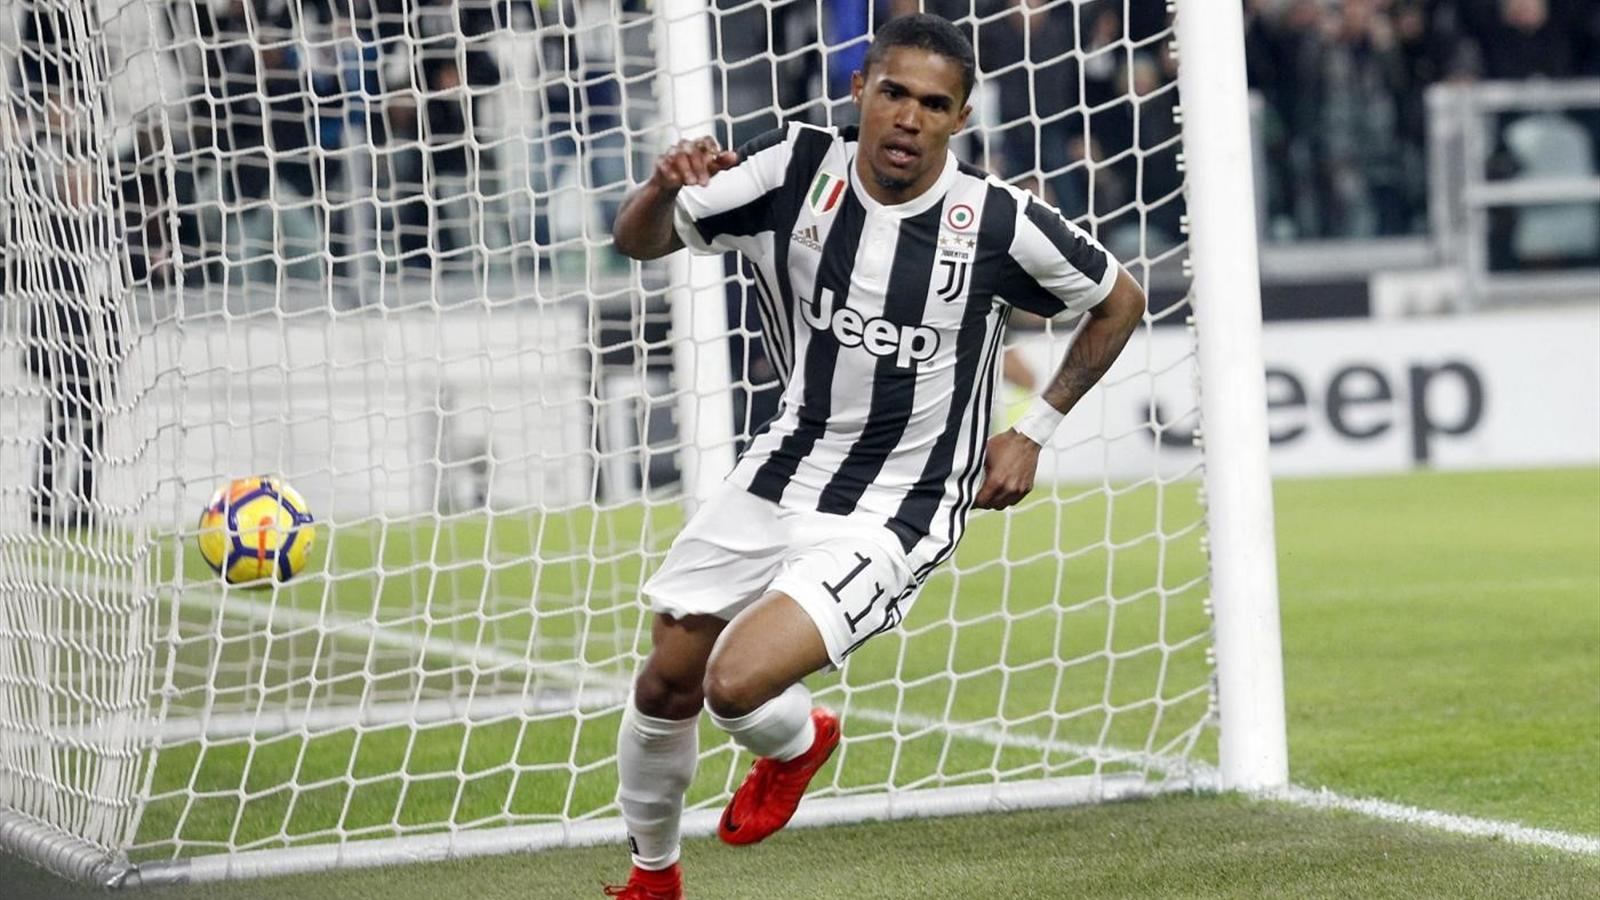 Le pagelle di Juventus-Genoa 1-0 - Serie A 2017-2018 ...